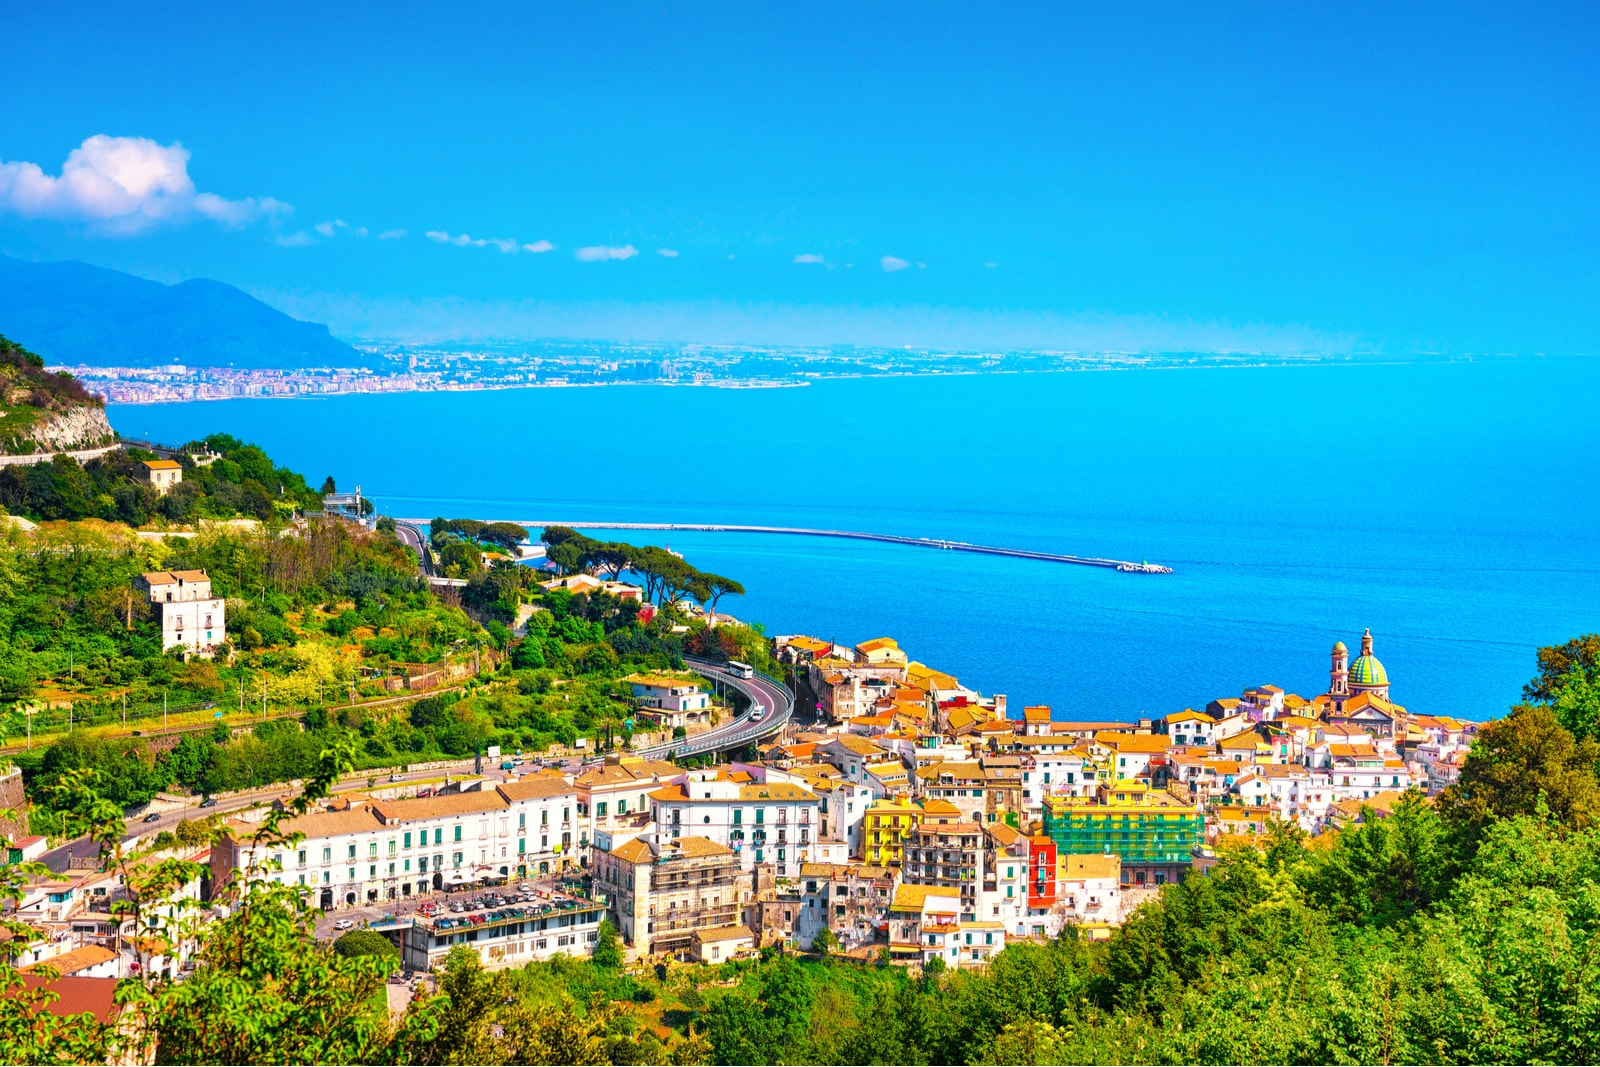 Vietri Coast Hotel - Vietri sul Mare salerno Italy